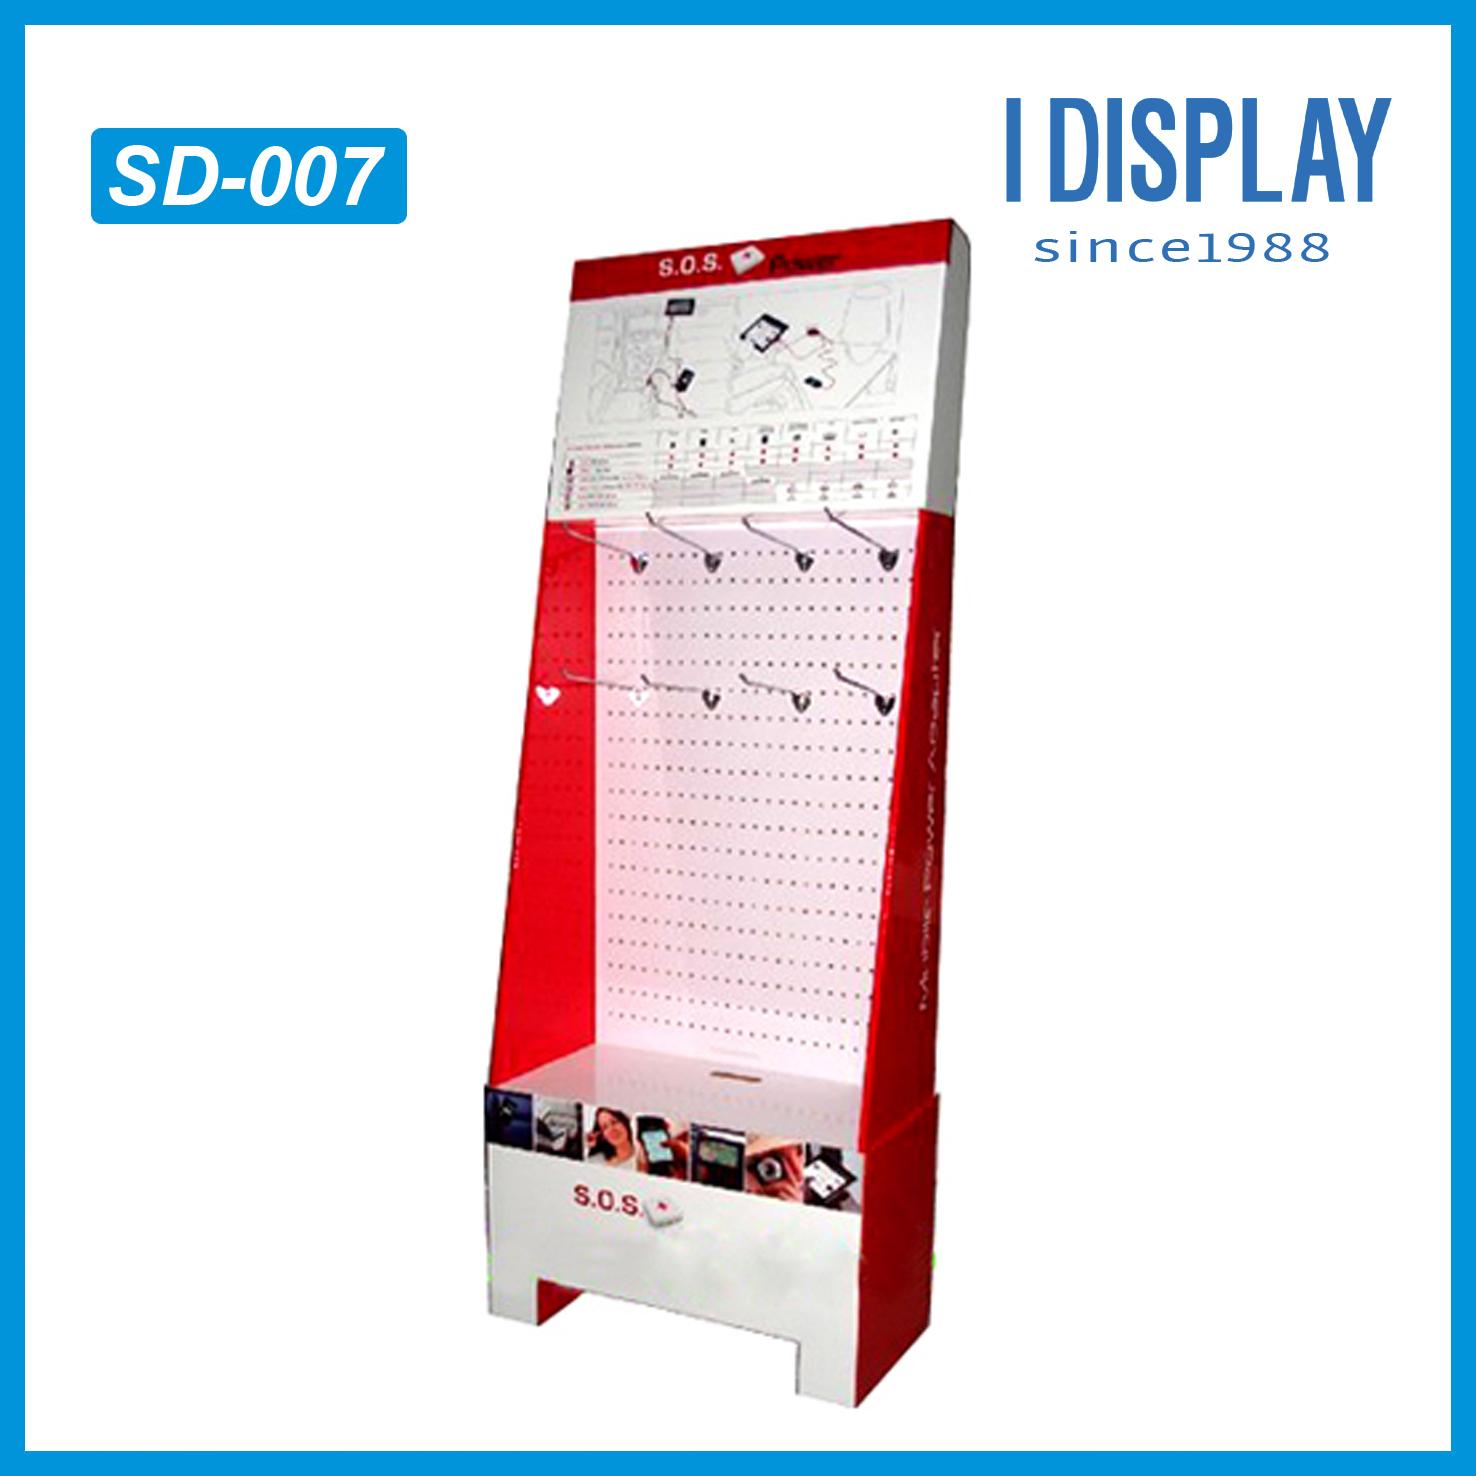 Sales Greeting Card Display Standsgreeting Card Displaygreeting